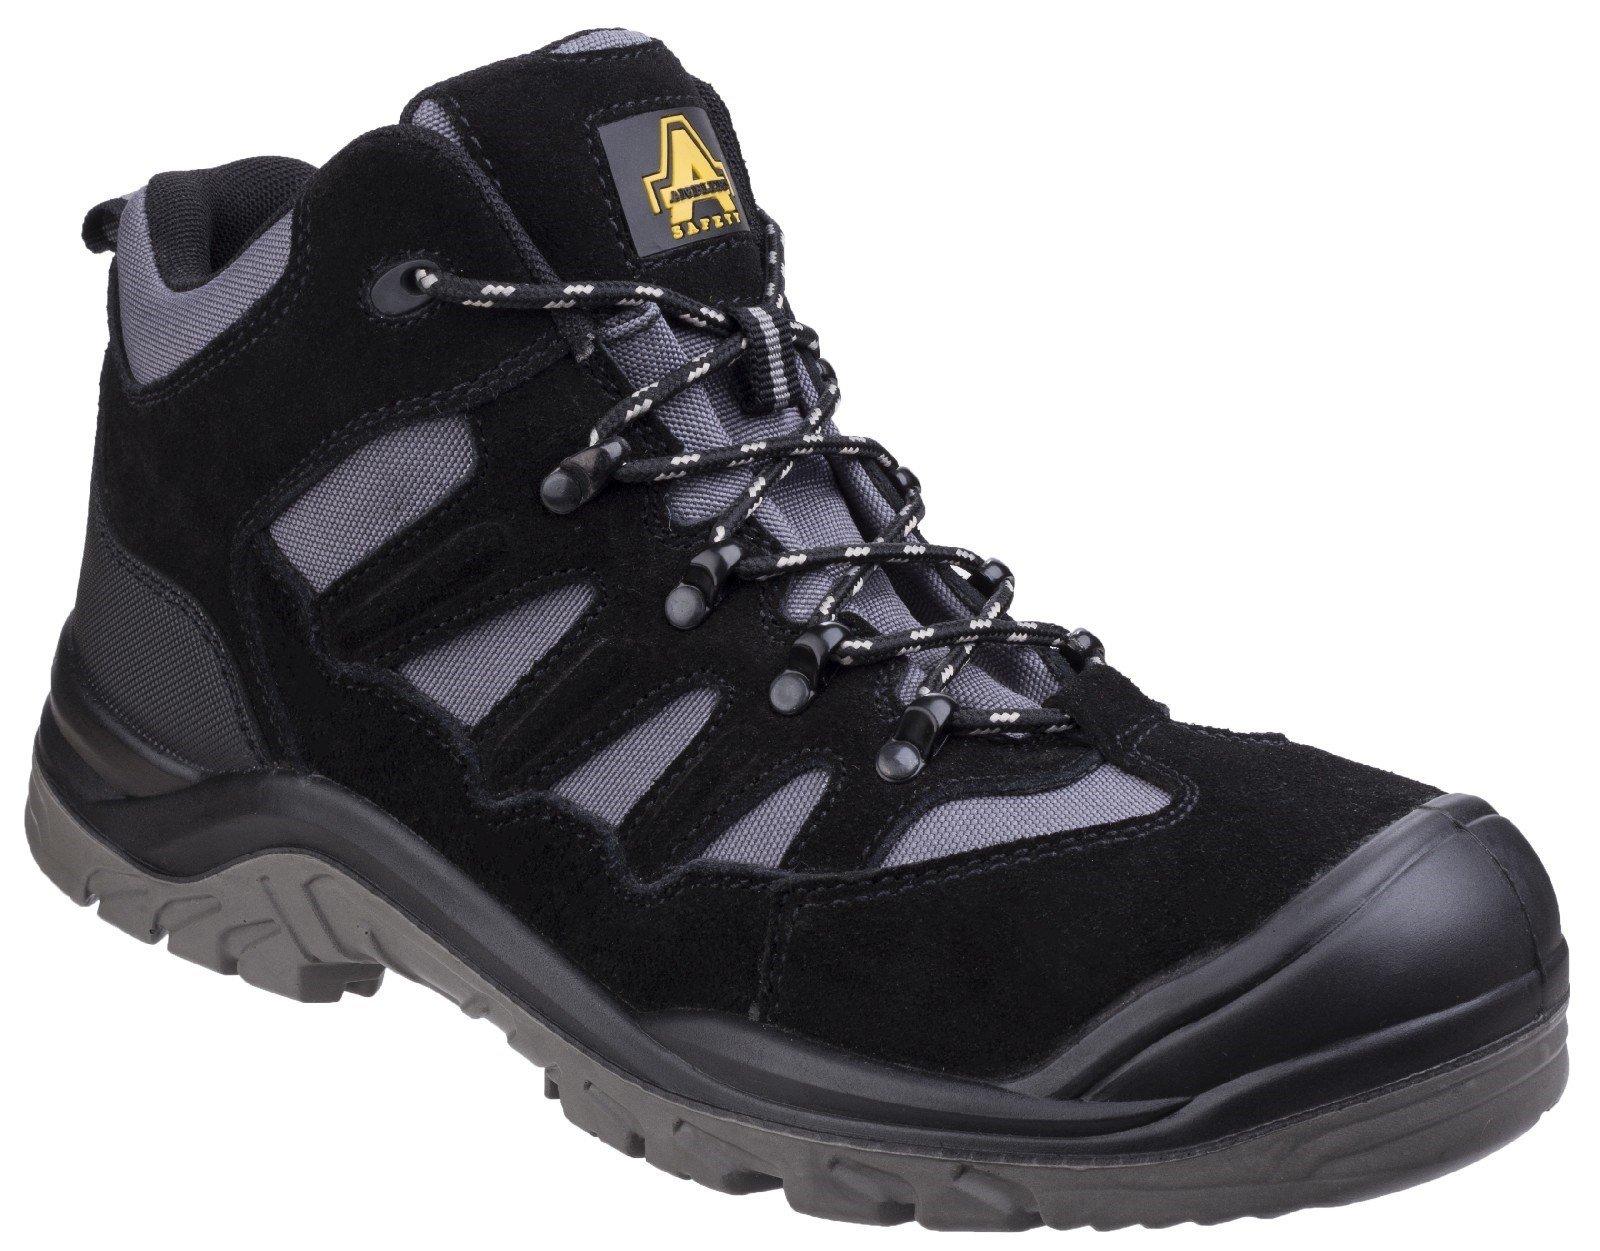 Amblers Unisex Safety Lightweight Hiker Boot Black 25508 - Black 4